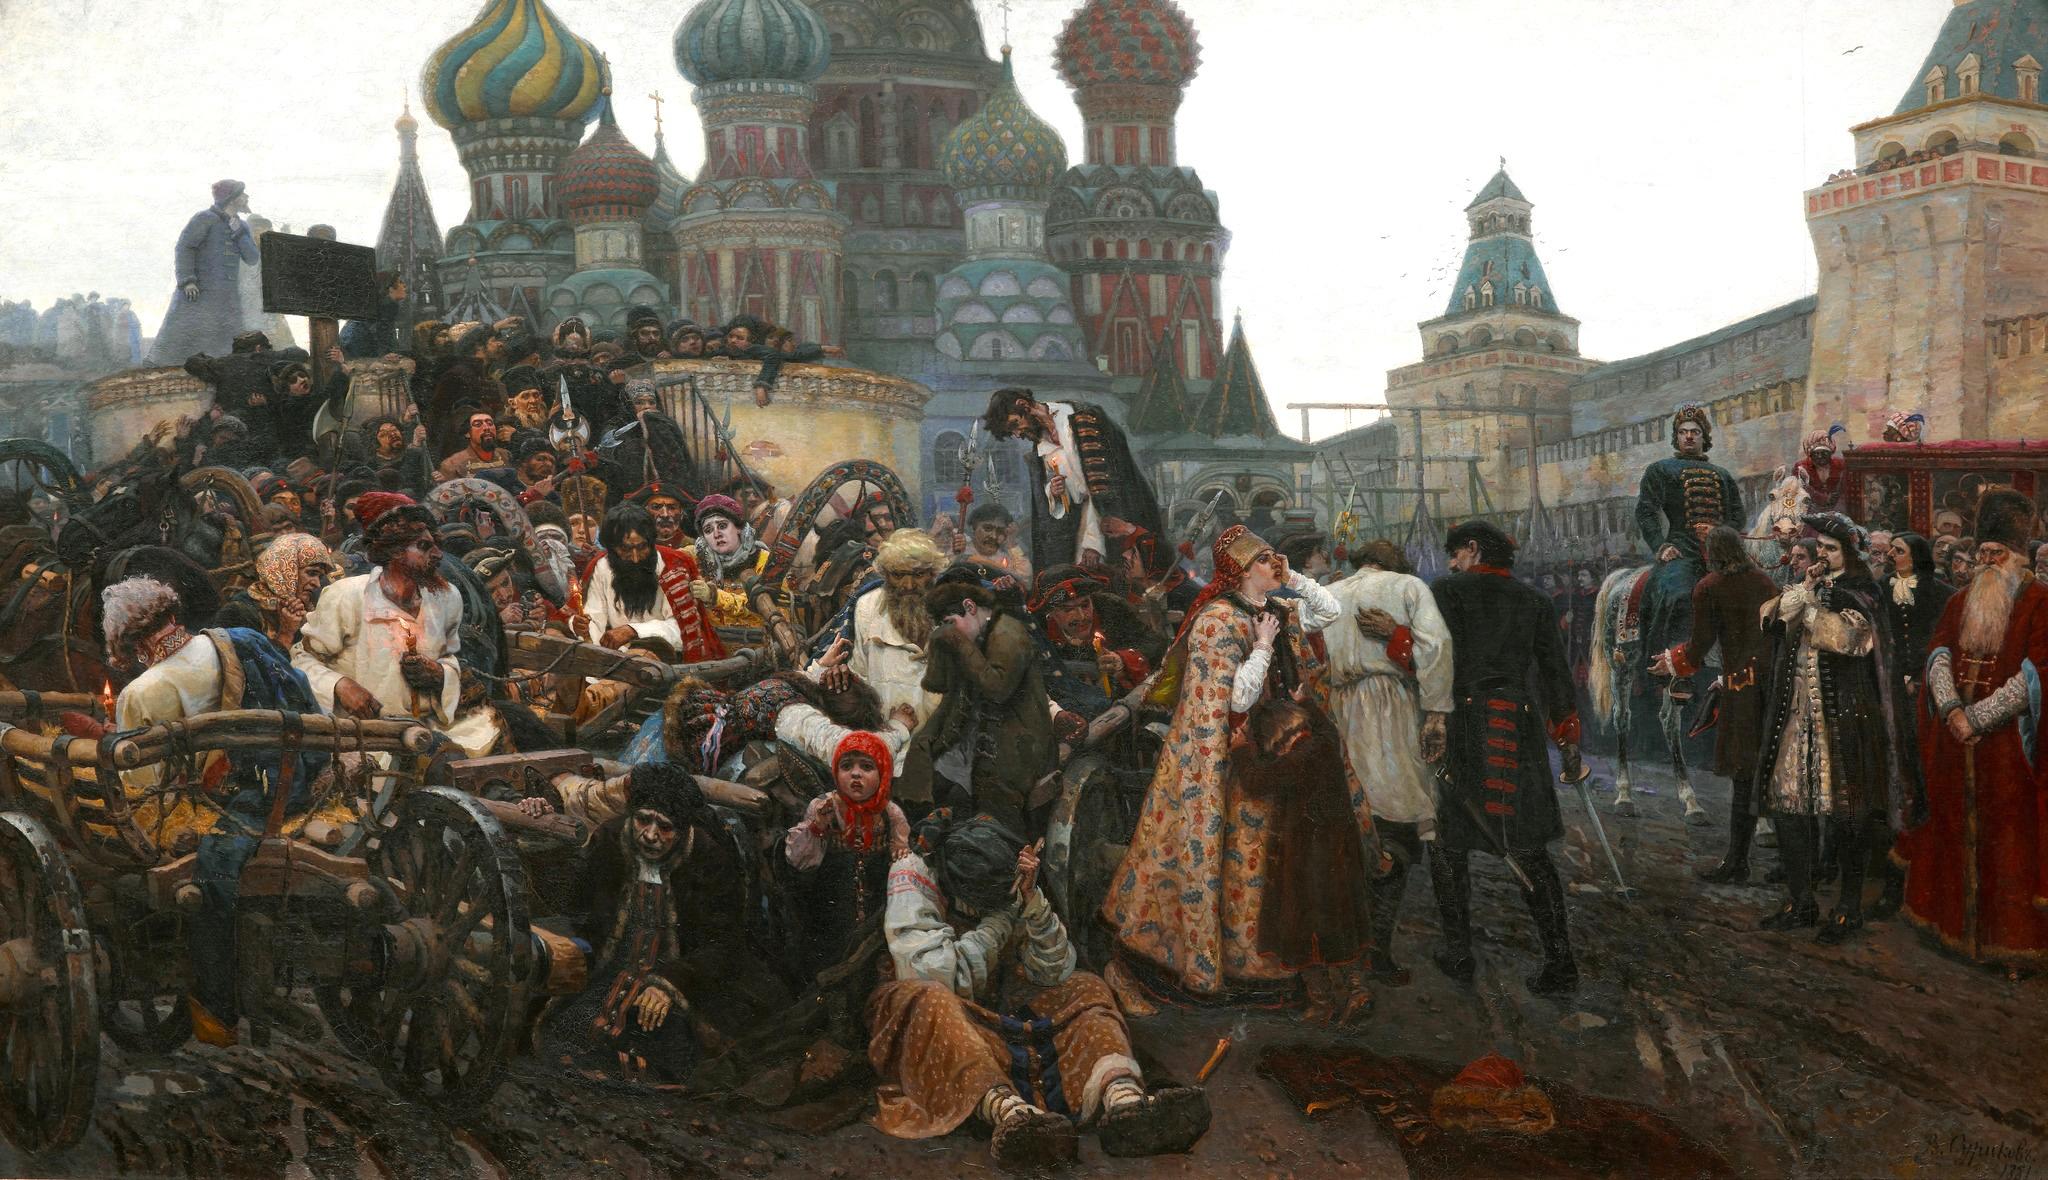 Morning of Execution of Streltsy. Artist Vasily Surikov, 1881.